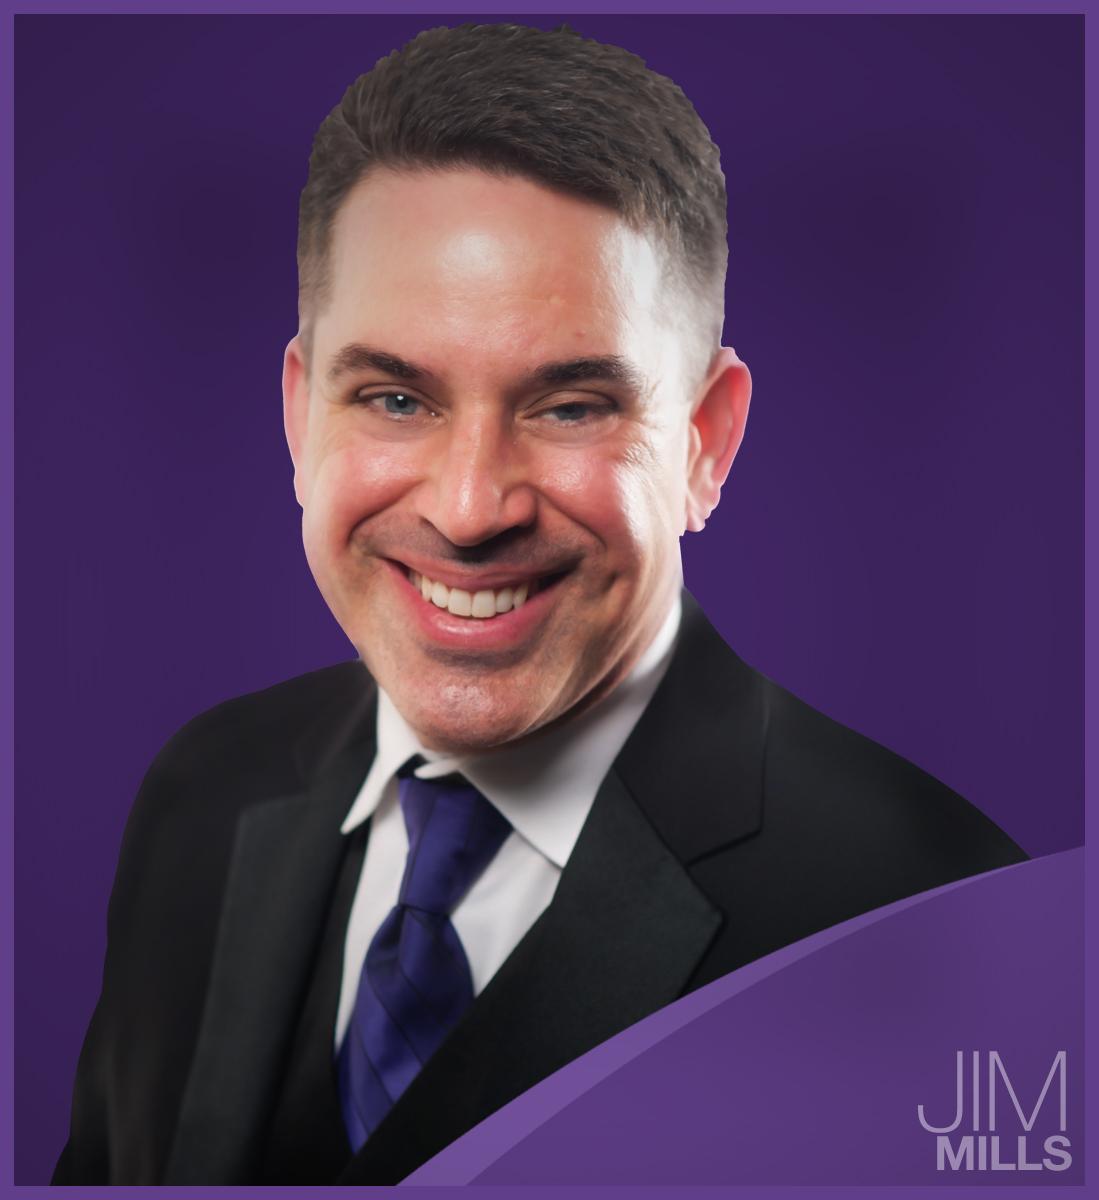 Jim Mills